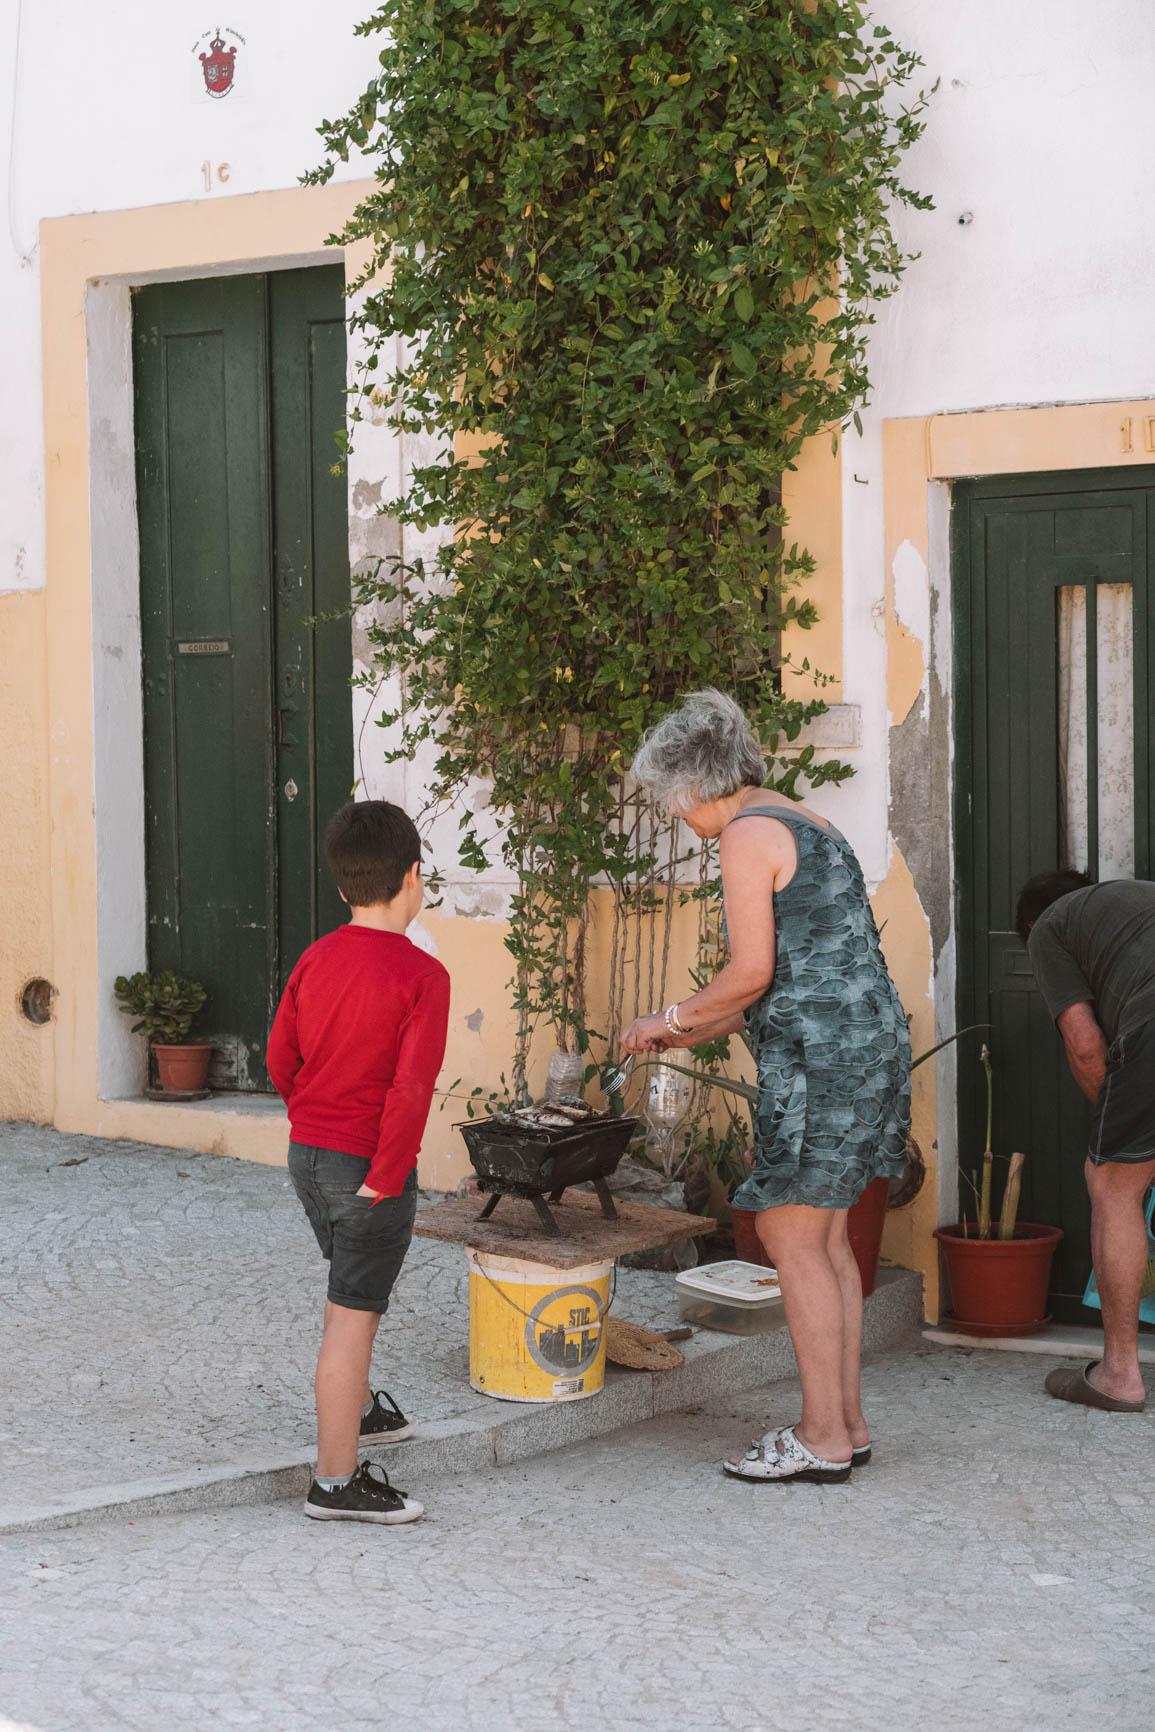 Elvas Alentejo road trip itinerary - things to do in Portugal